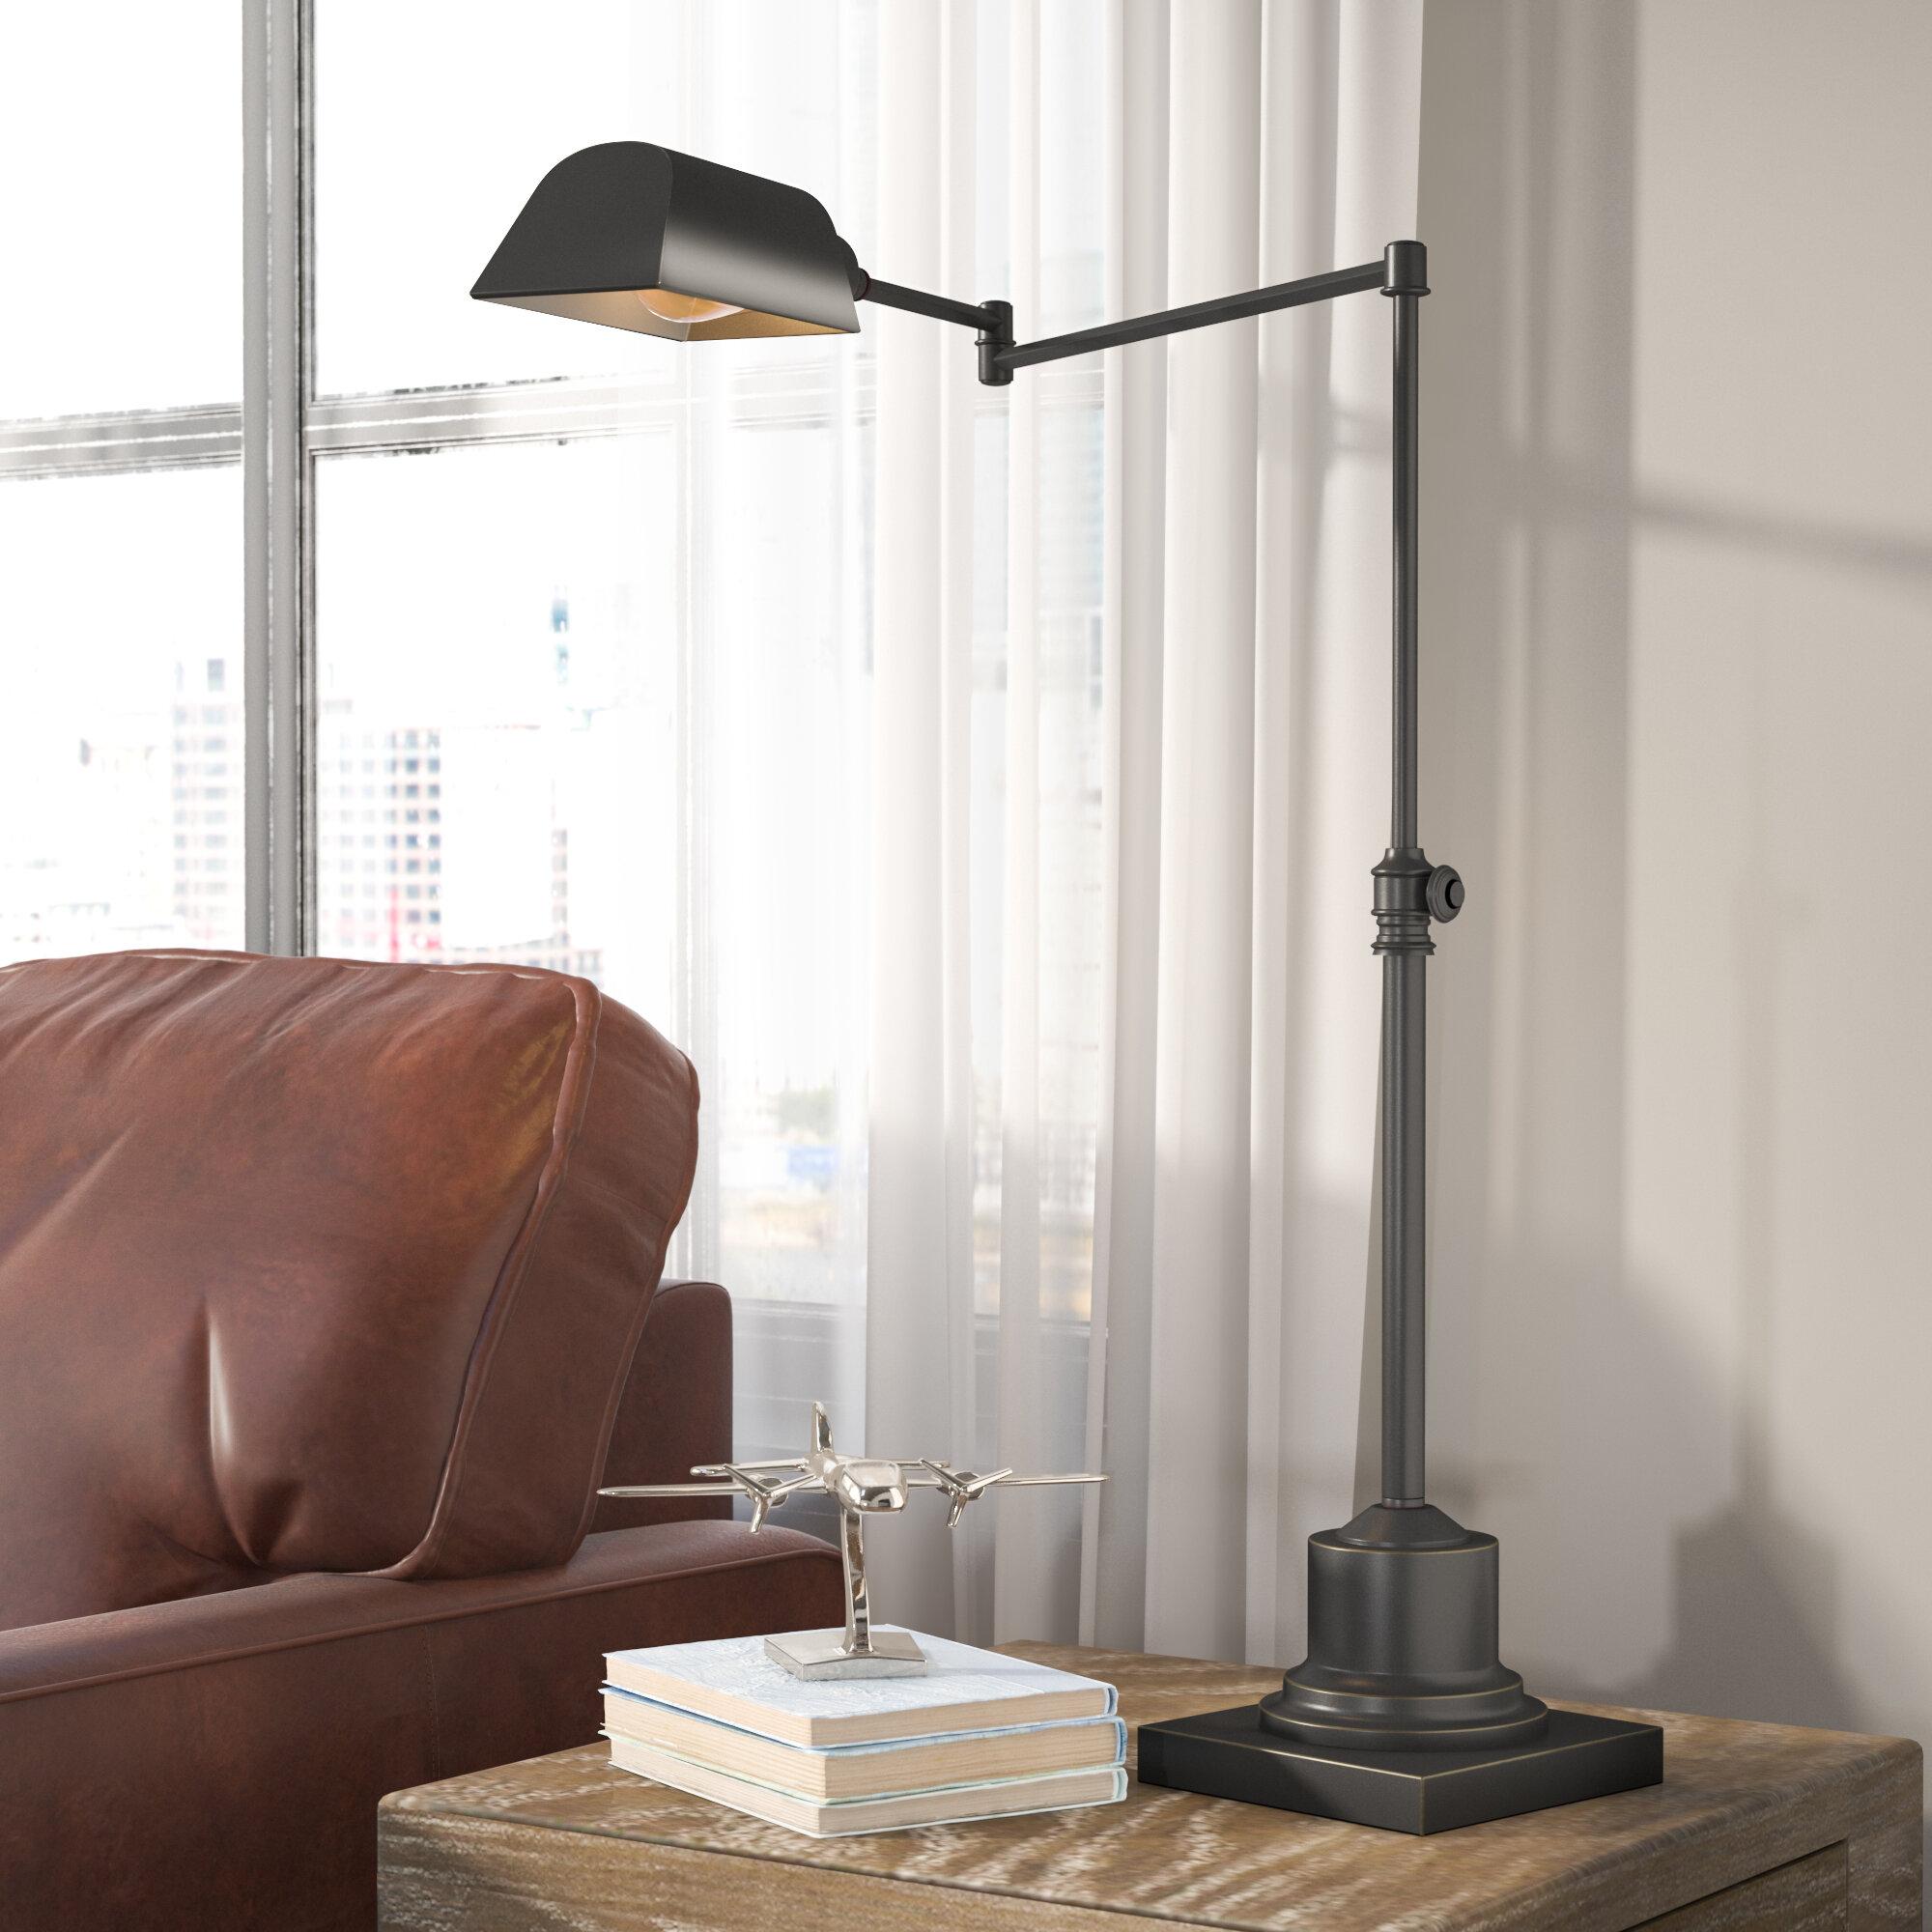 halogen furniture interior lamp with design ideas home desk images hd dmdmagazine adjustable picture